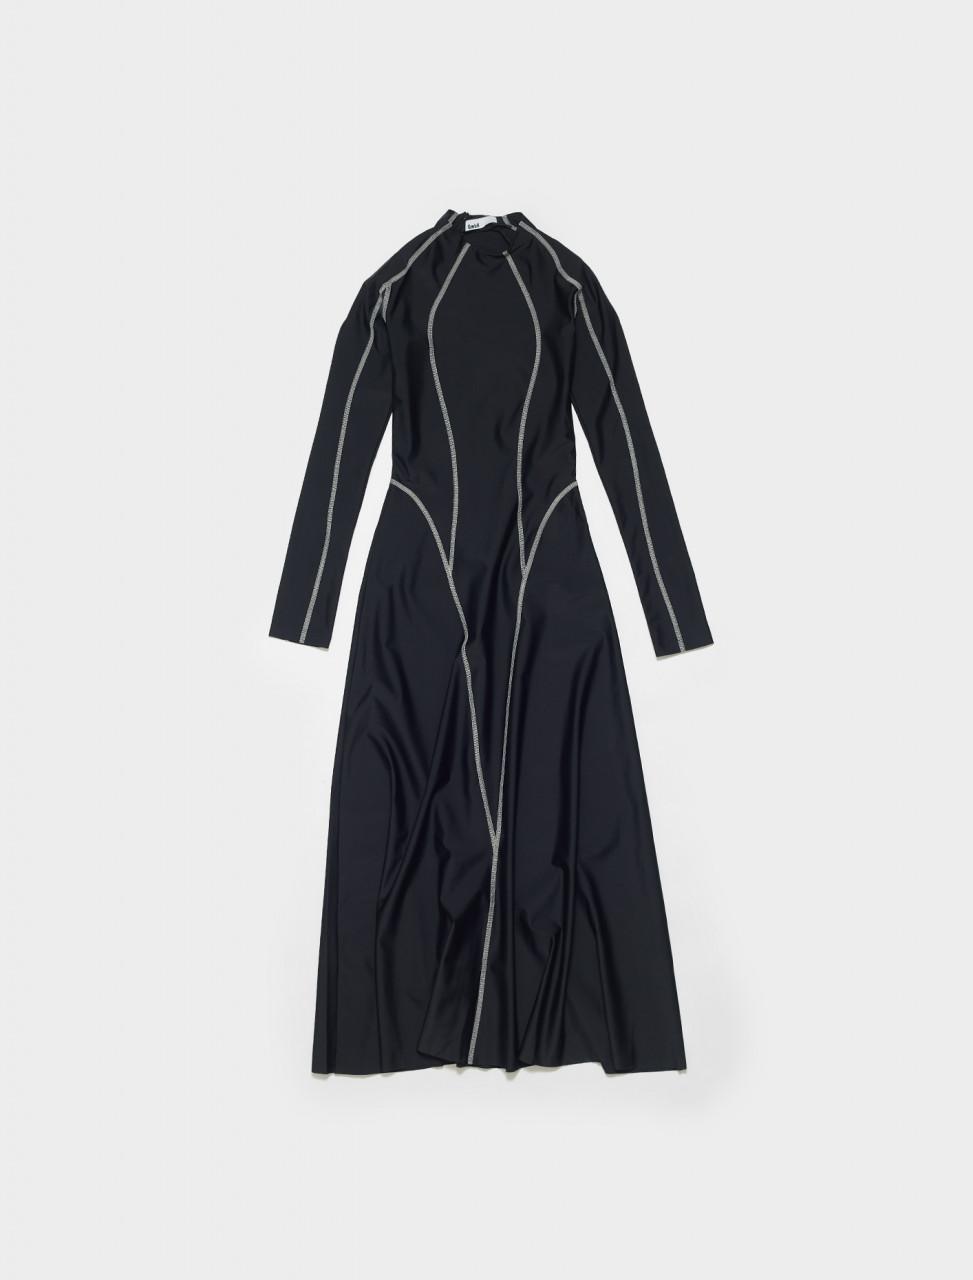 ELIF_W-BLACK GMBH ELIF DRESS BLACK